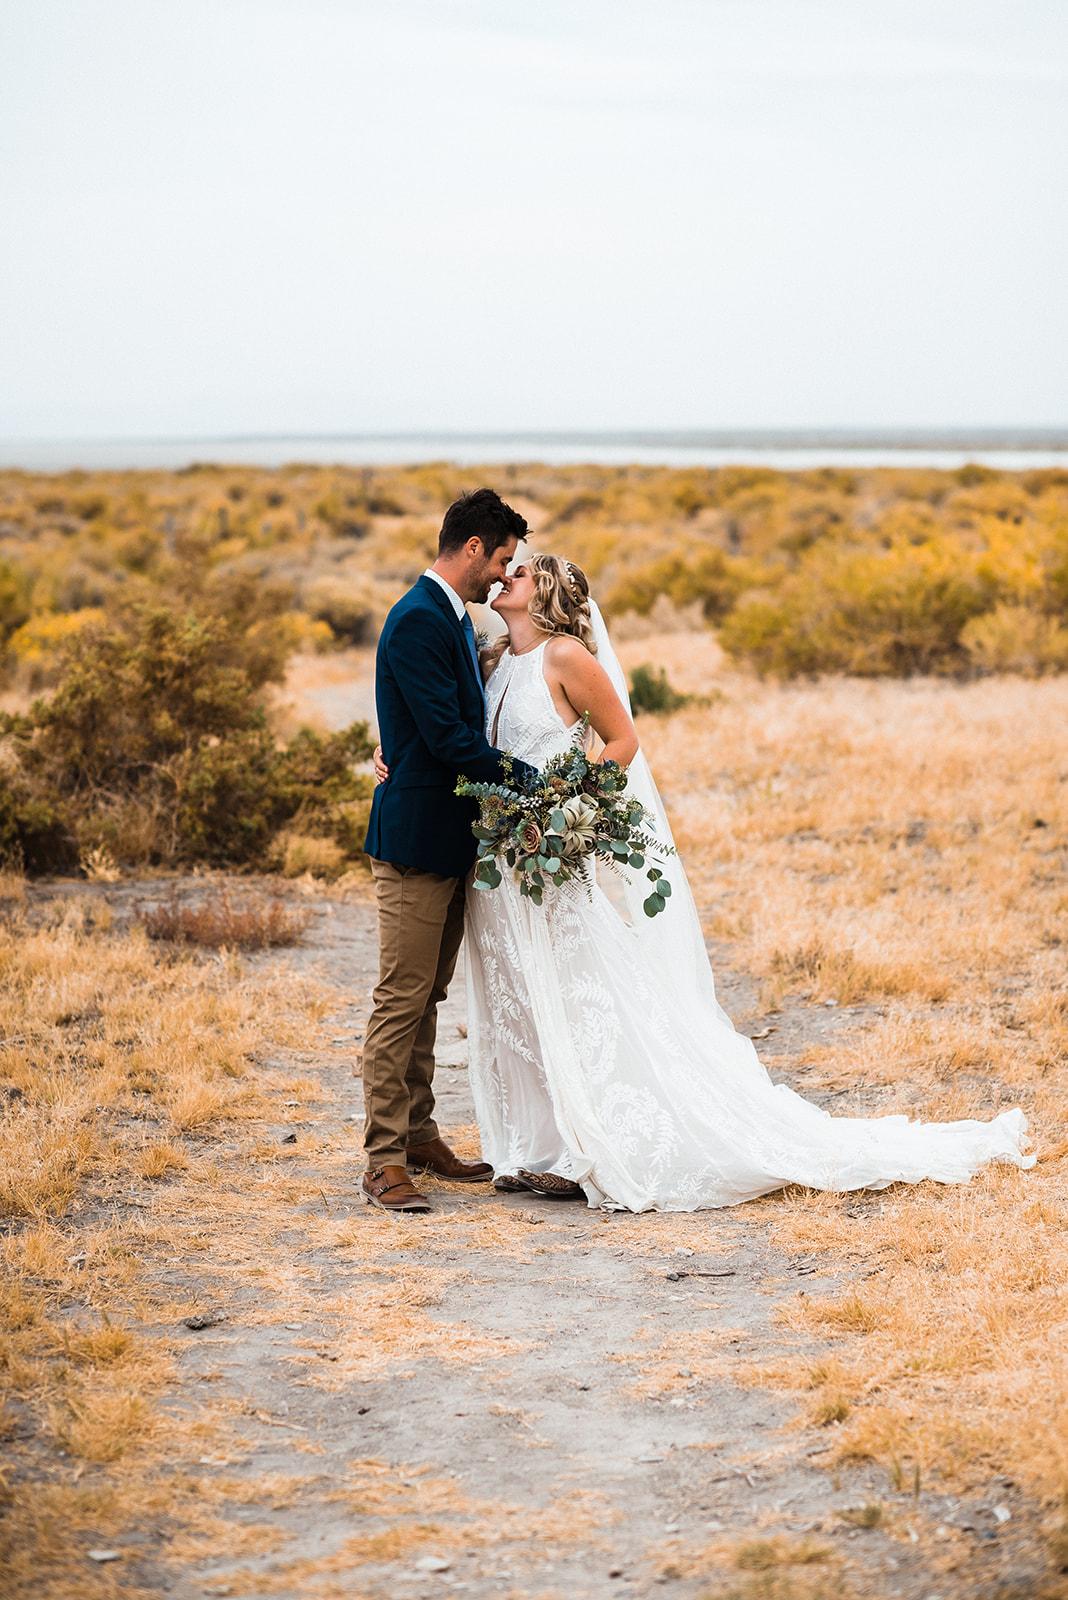 Madison_Guy_Wedding_The_Foxes_Photography_101.jpg